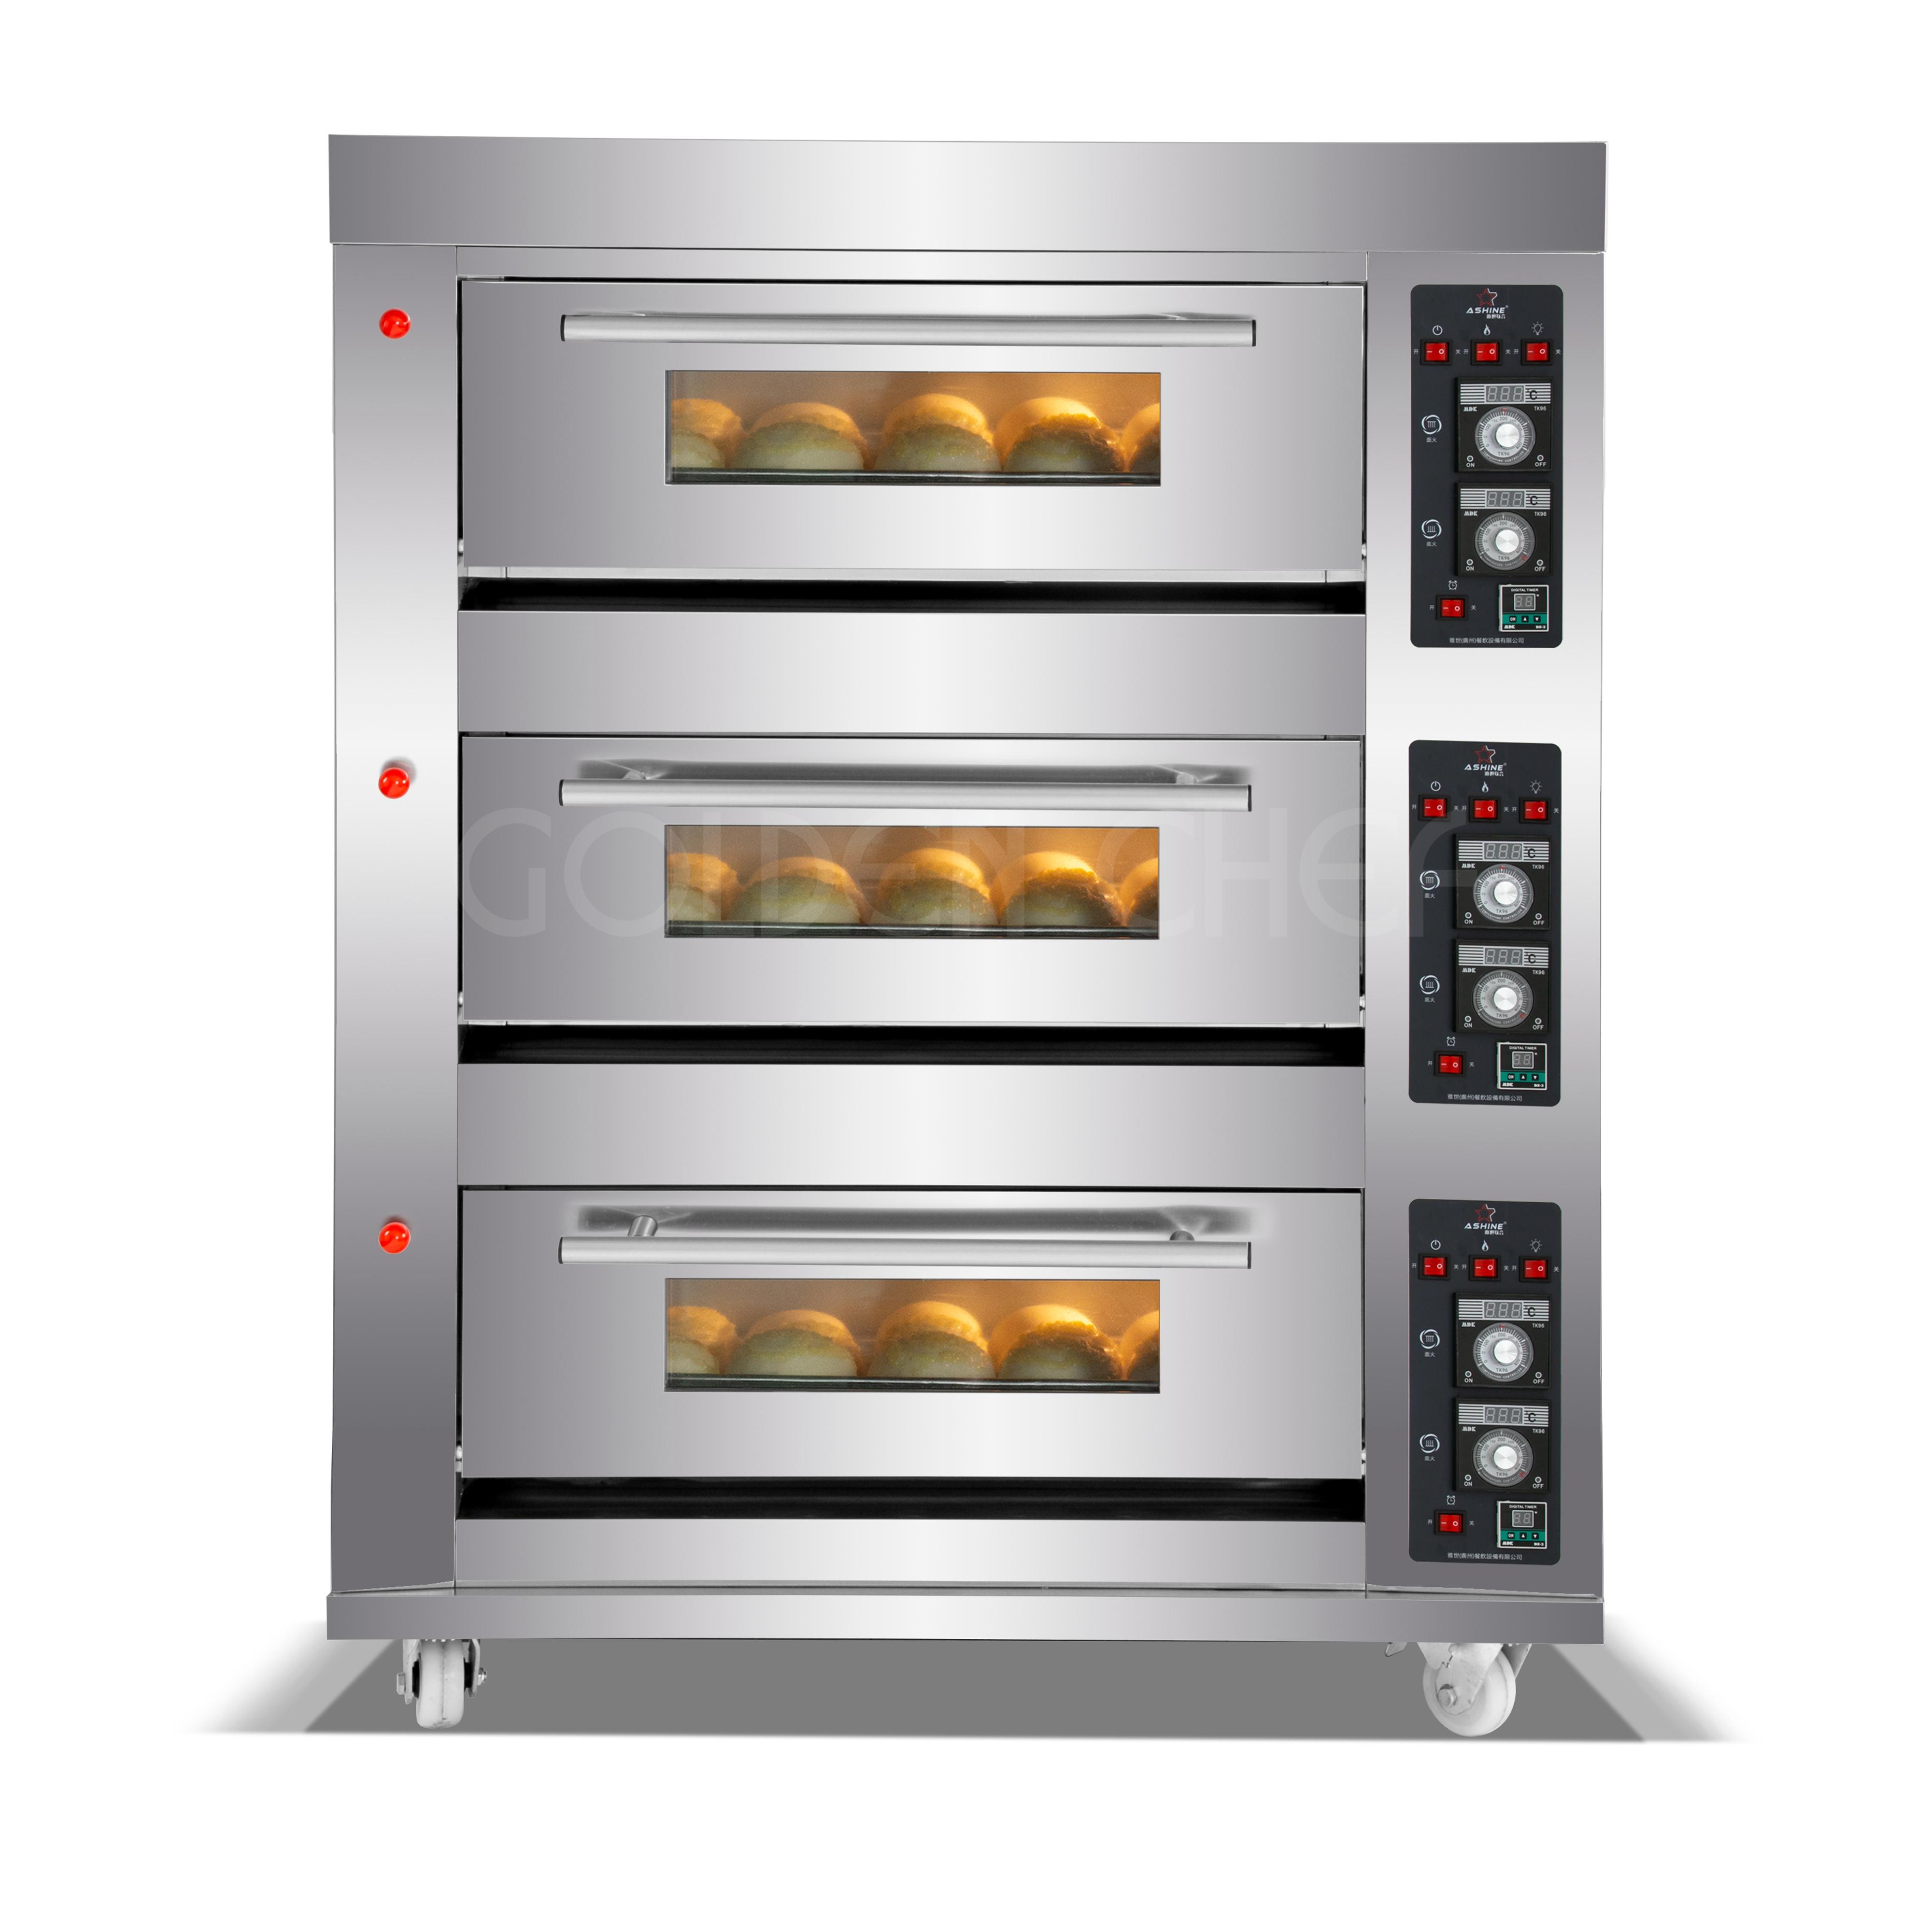 Gas oven燃气烘炉/智能燃气烘炉